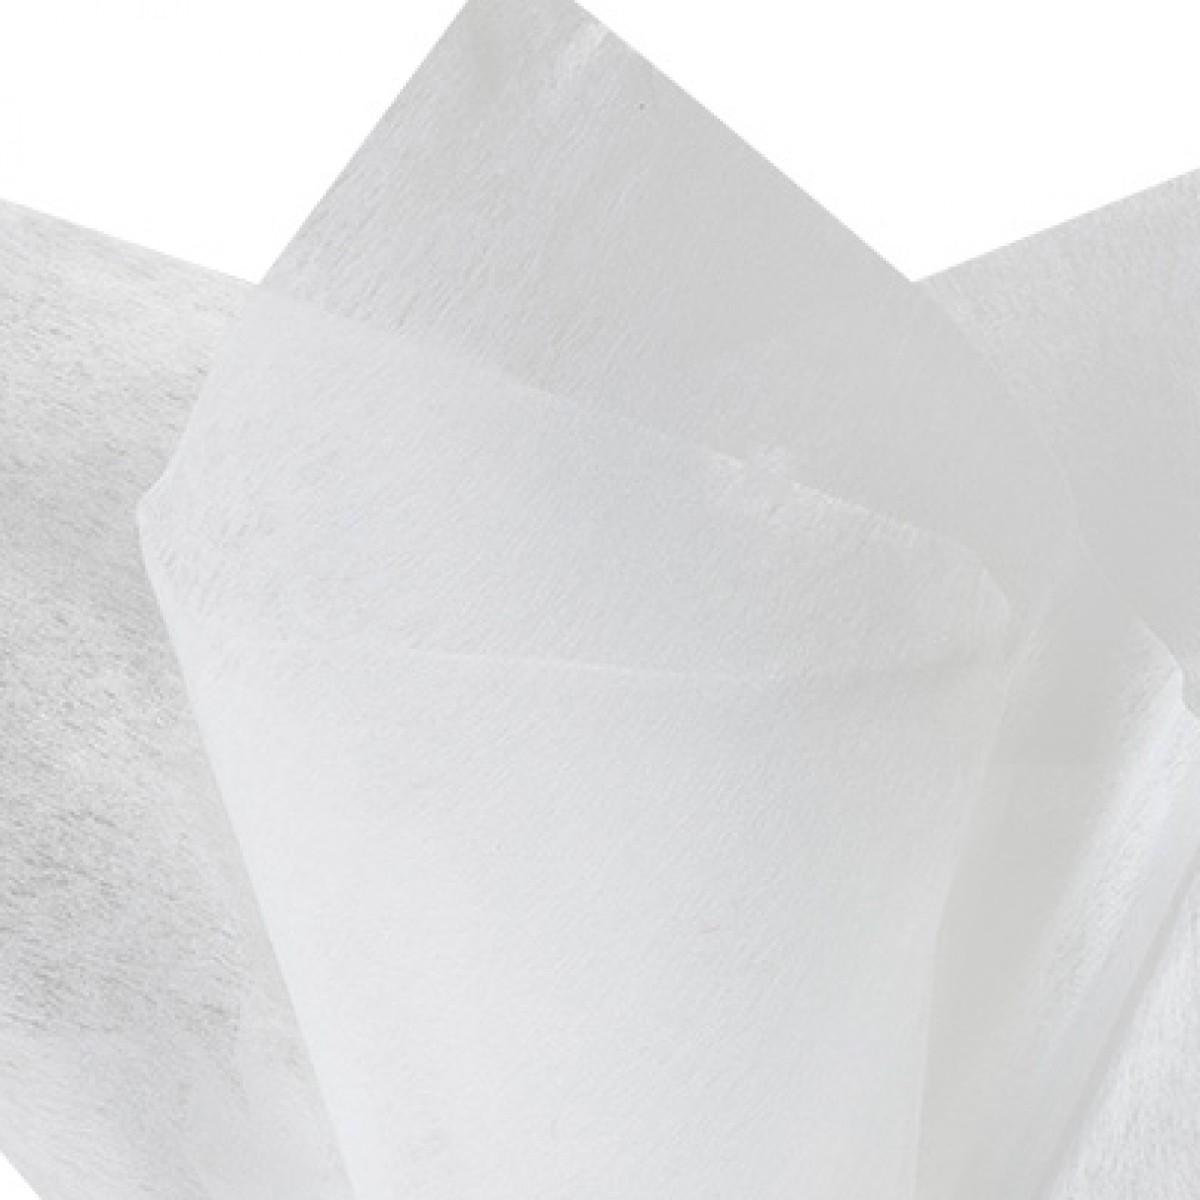 7512 Ivory 75cmx60cm Tissue Floral Wraps - 100 Sheets